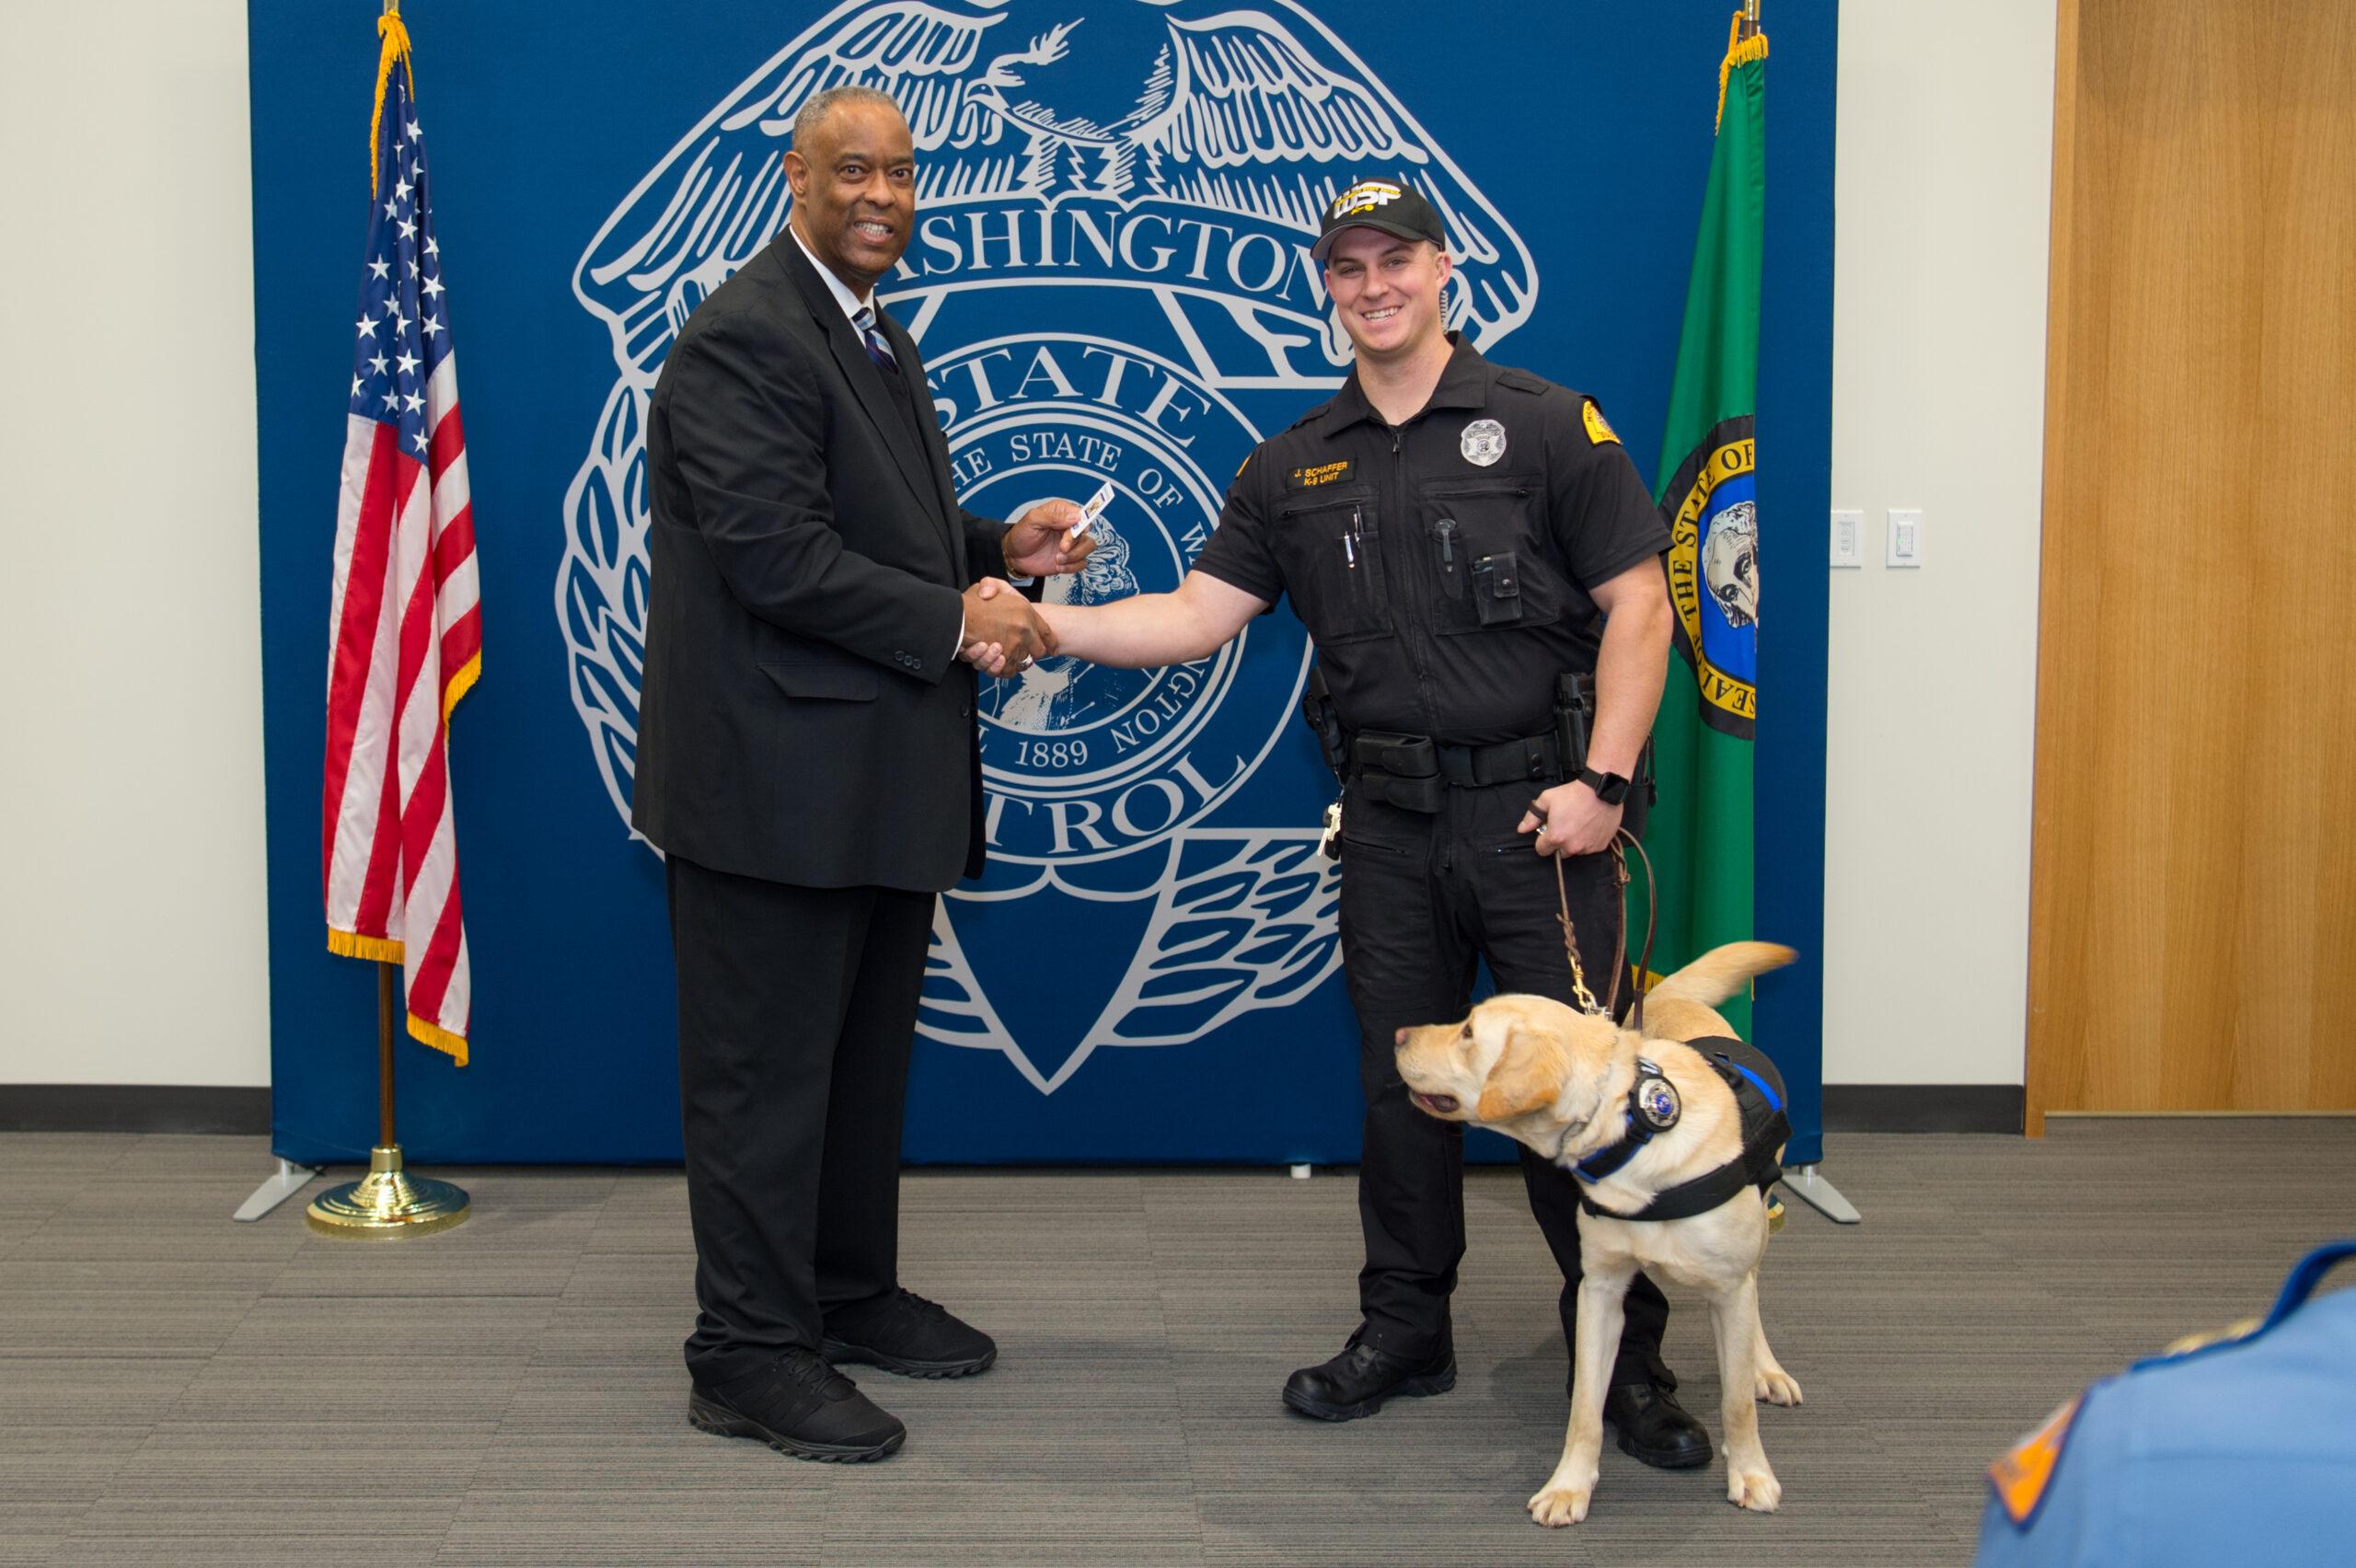 Washington state Patrol, Trooper Justin R. Schaffer, wsp trooper, wsp trooper killed in the line of duty